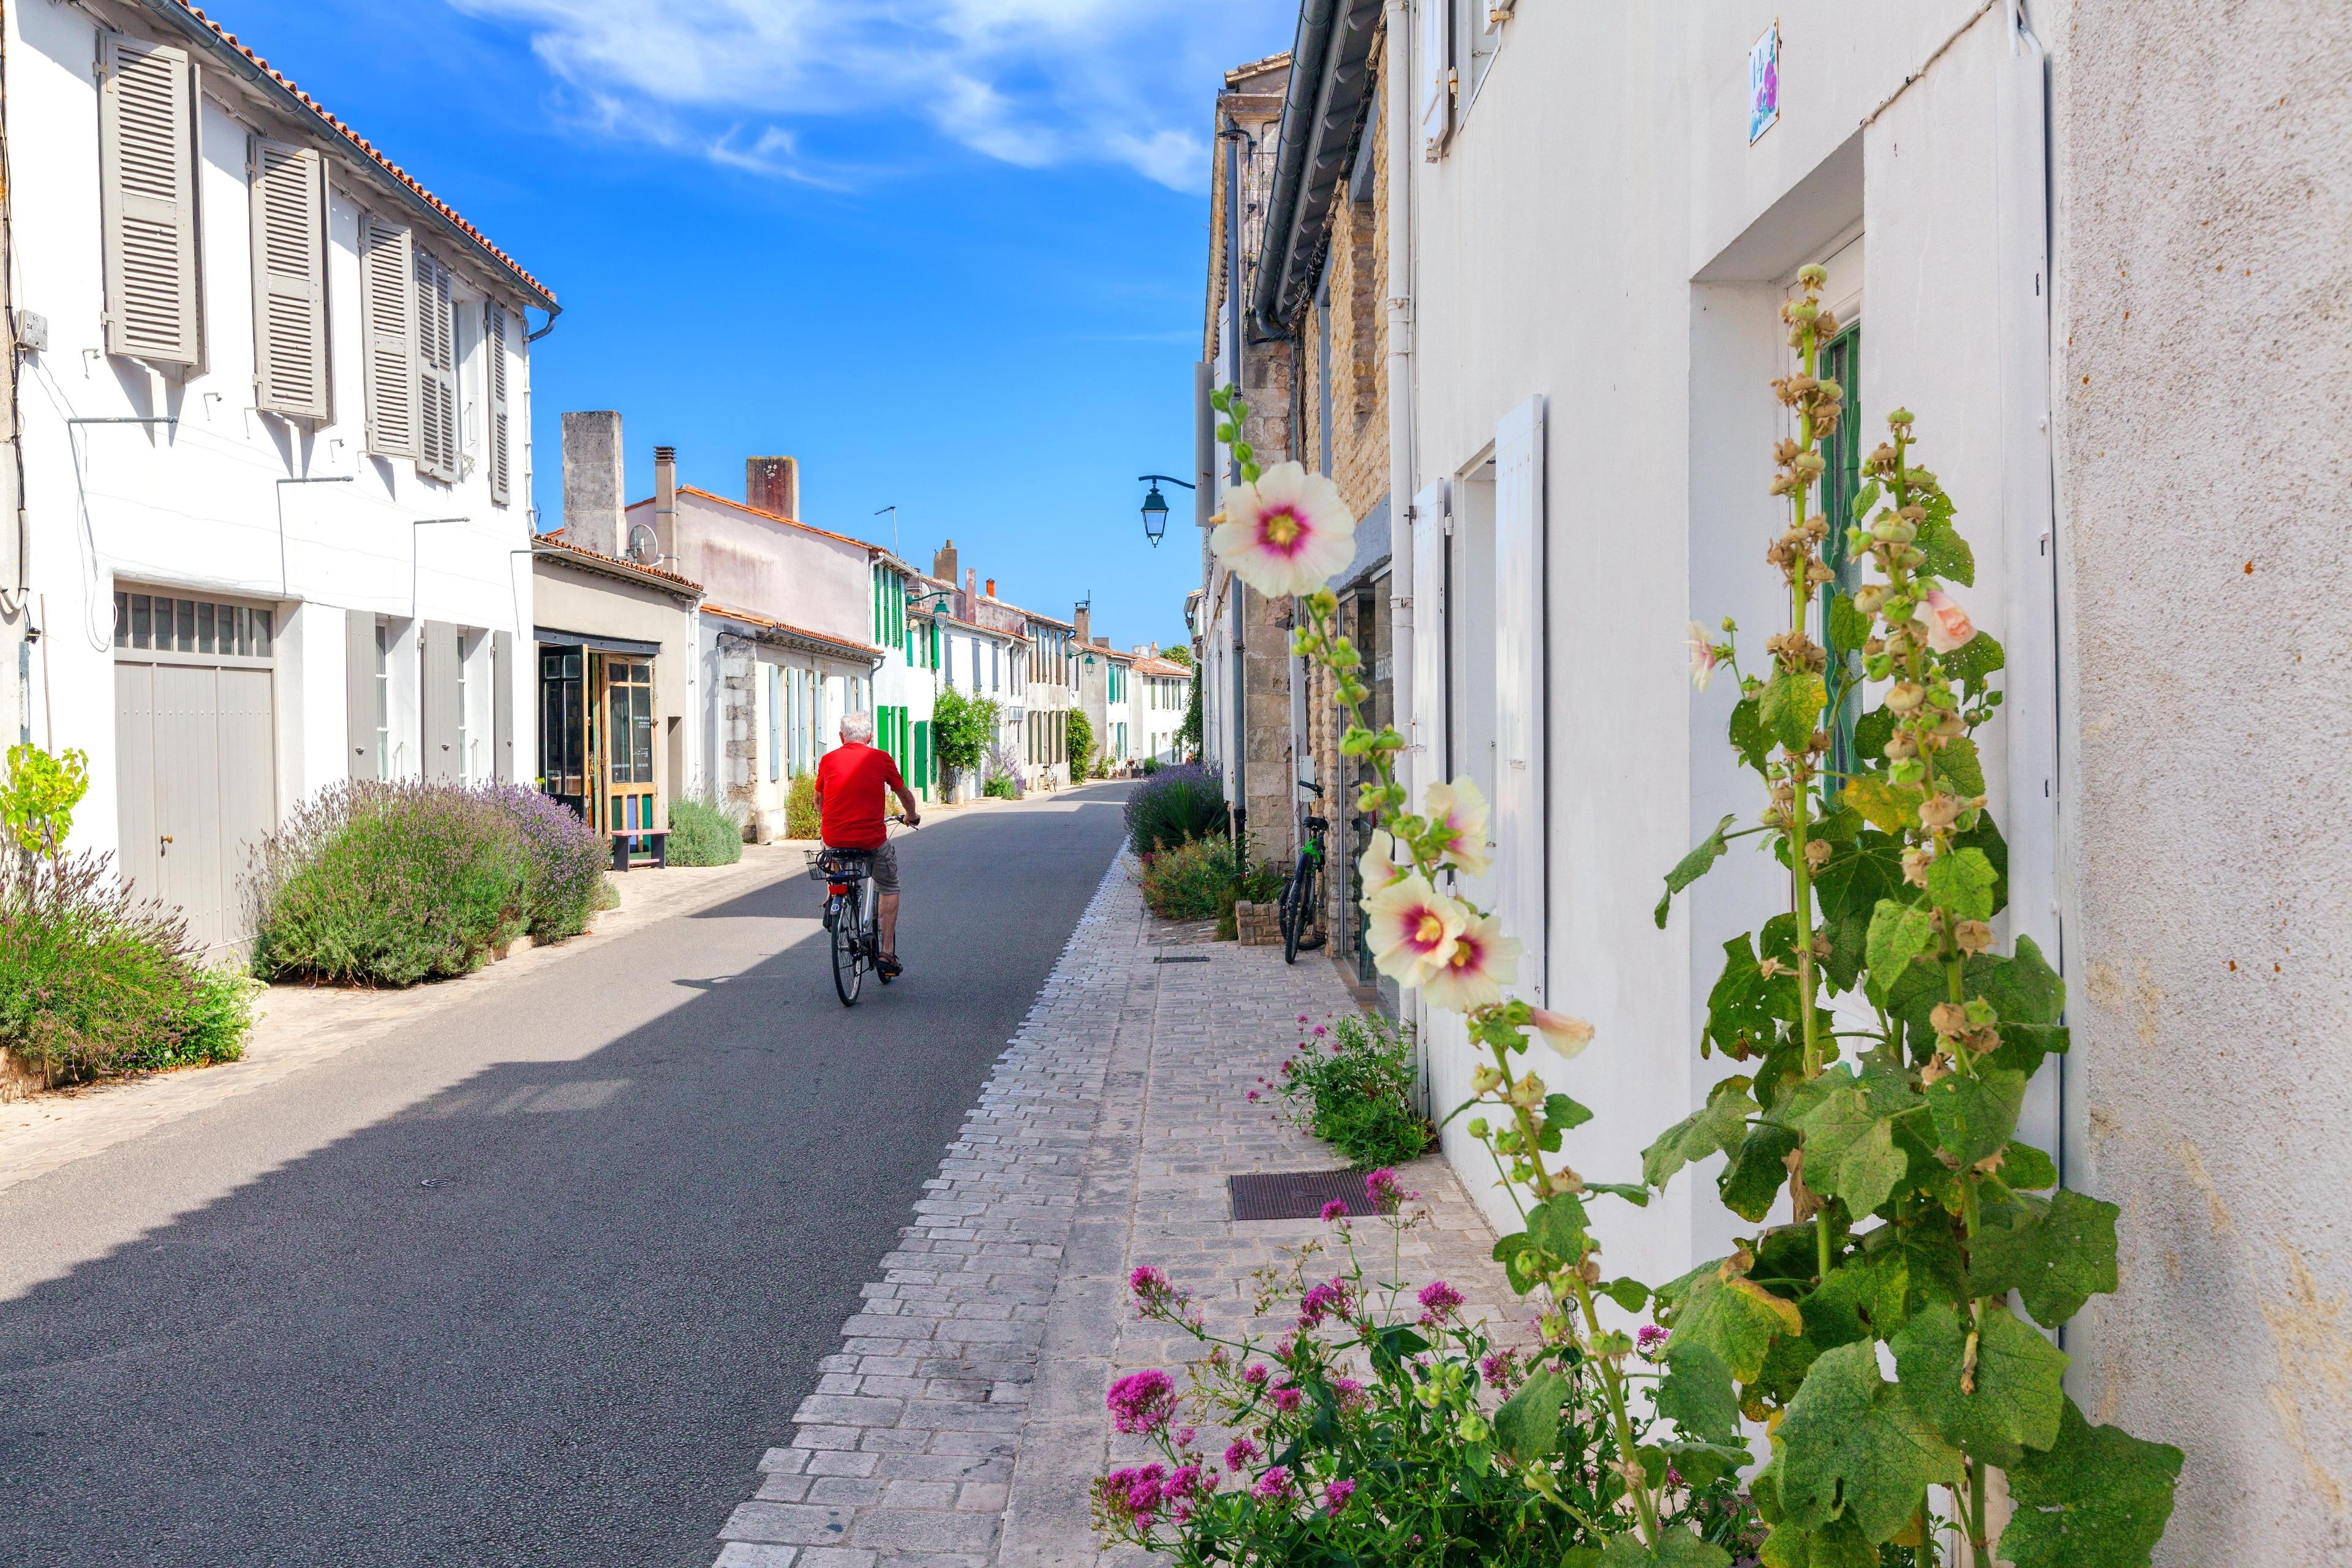 Ars-en-Re, Charente-Maritime, France